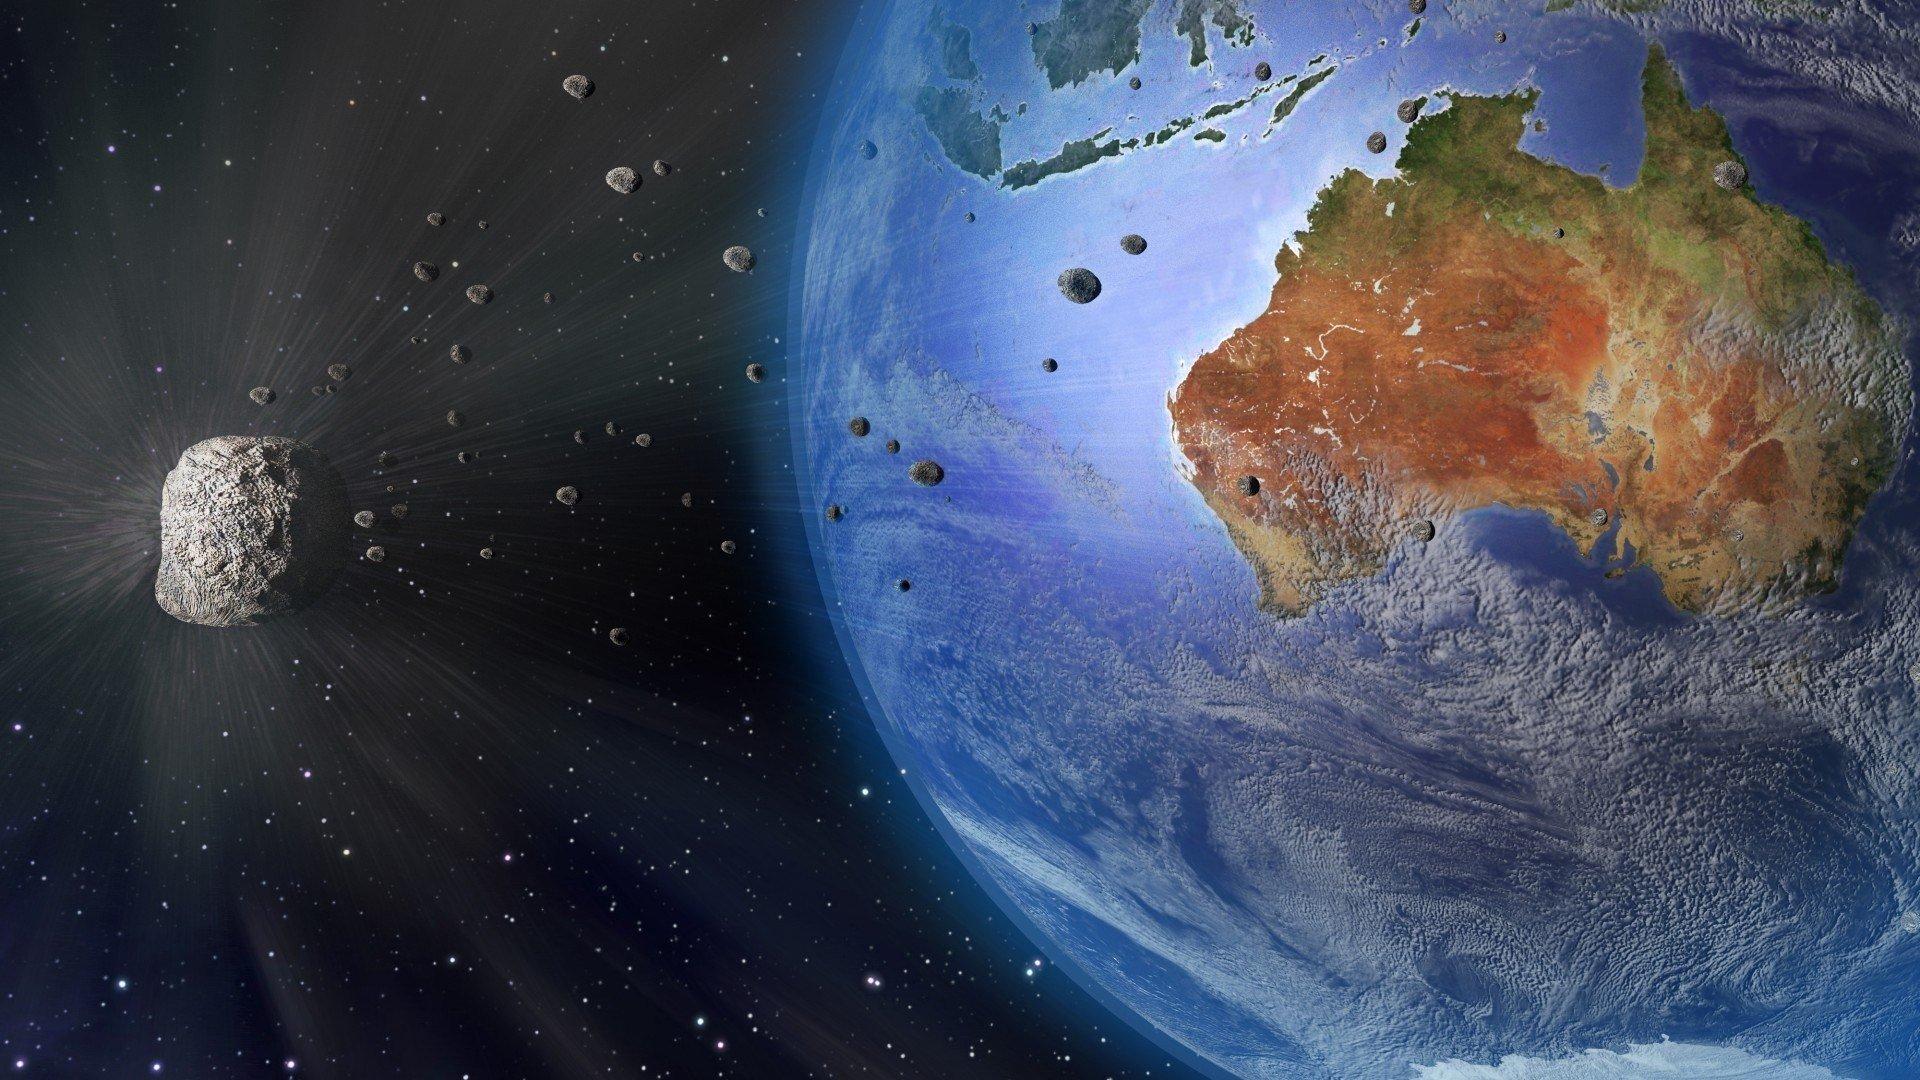 Earth Digital Art Hd Wallpaper: Digital Art, Space Art, Meteors, Earth, Continents